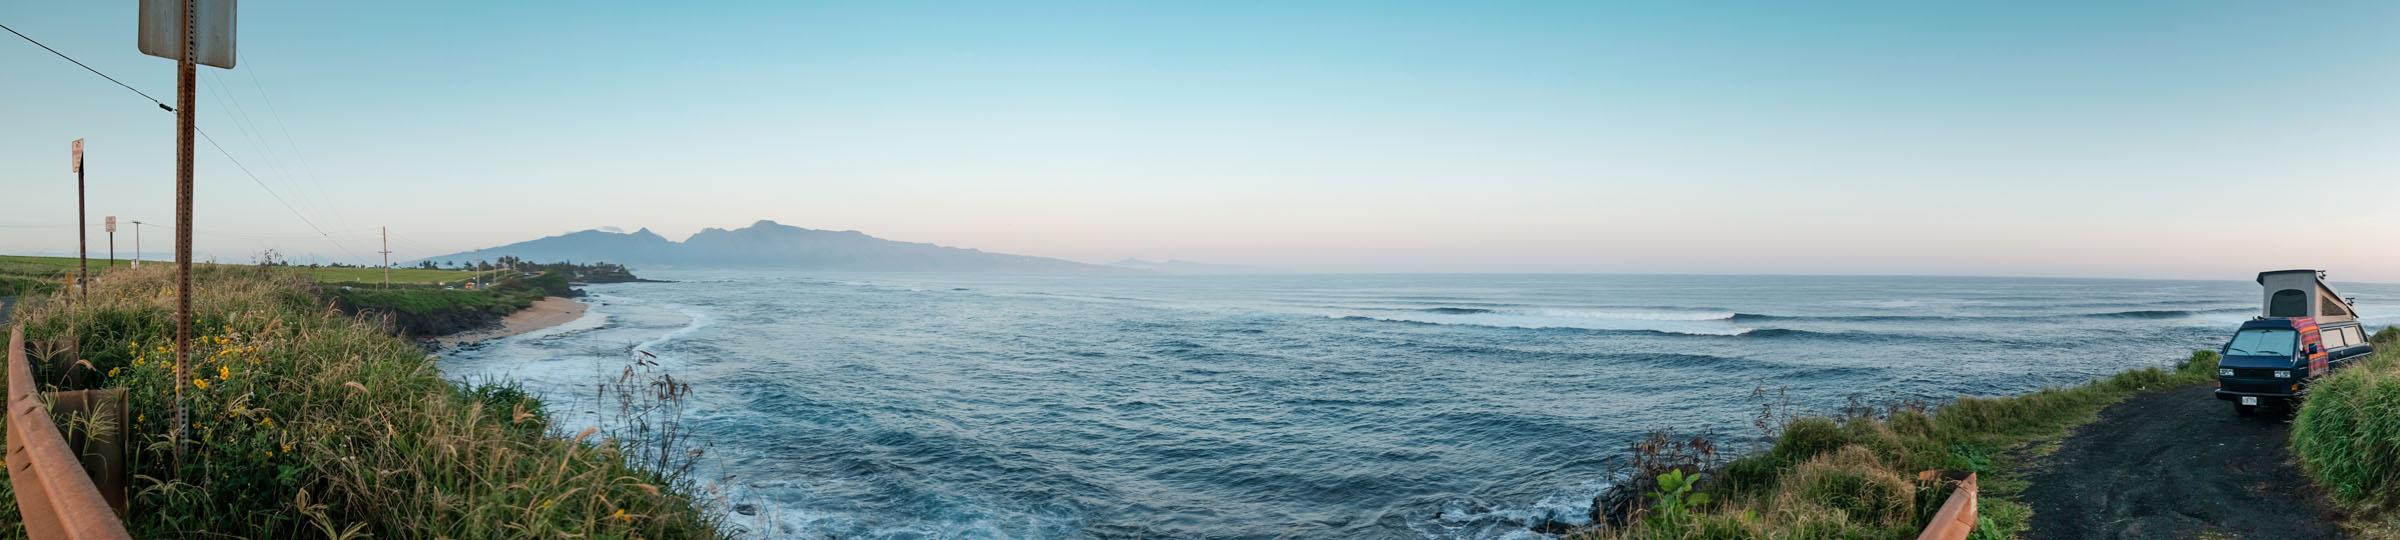 DSCF2508_Maliko Bay.jpg